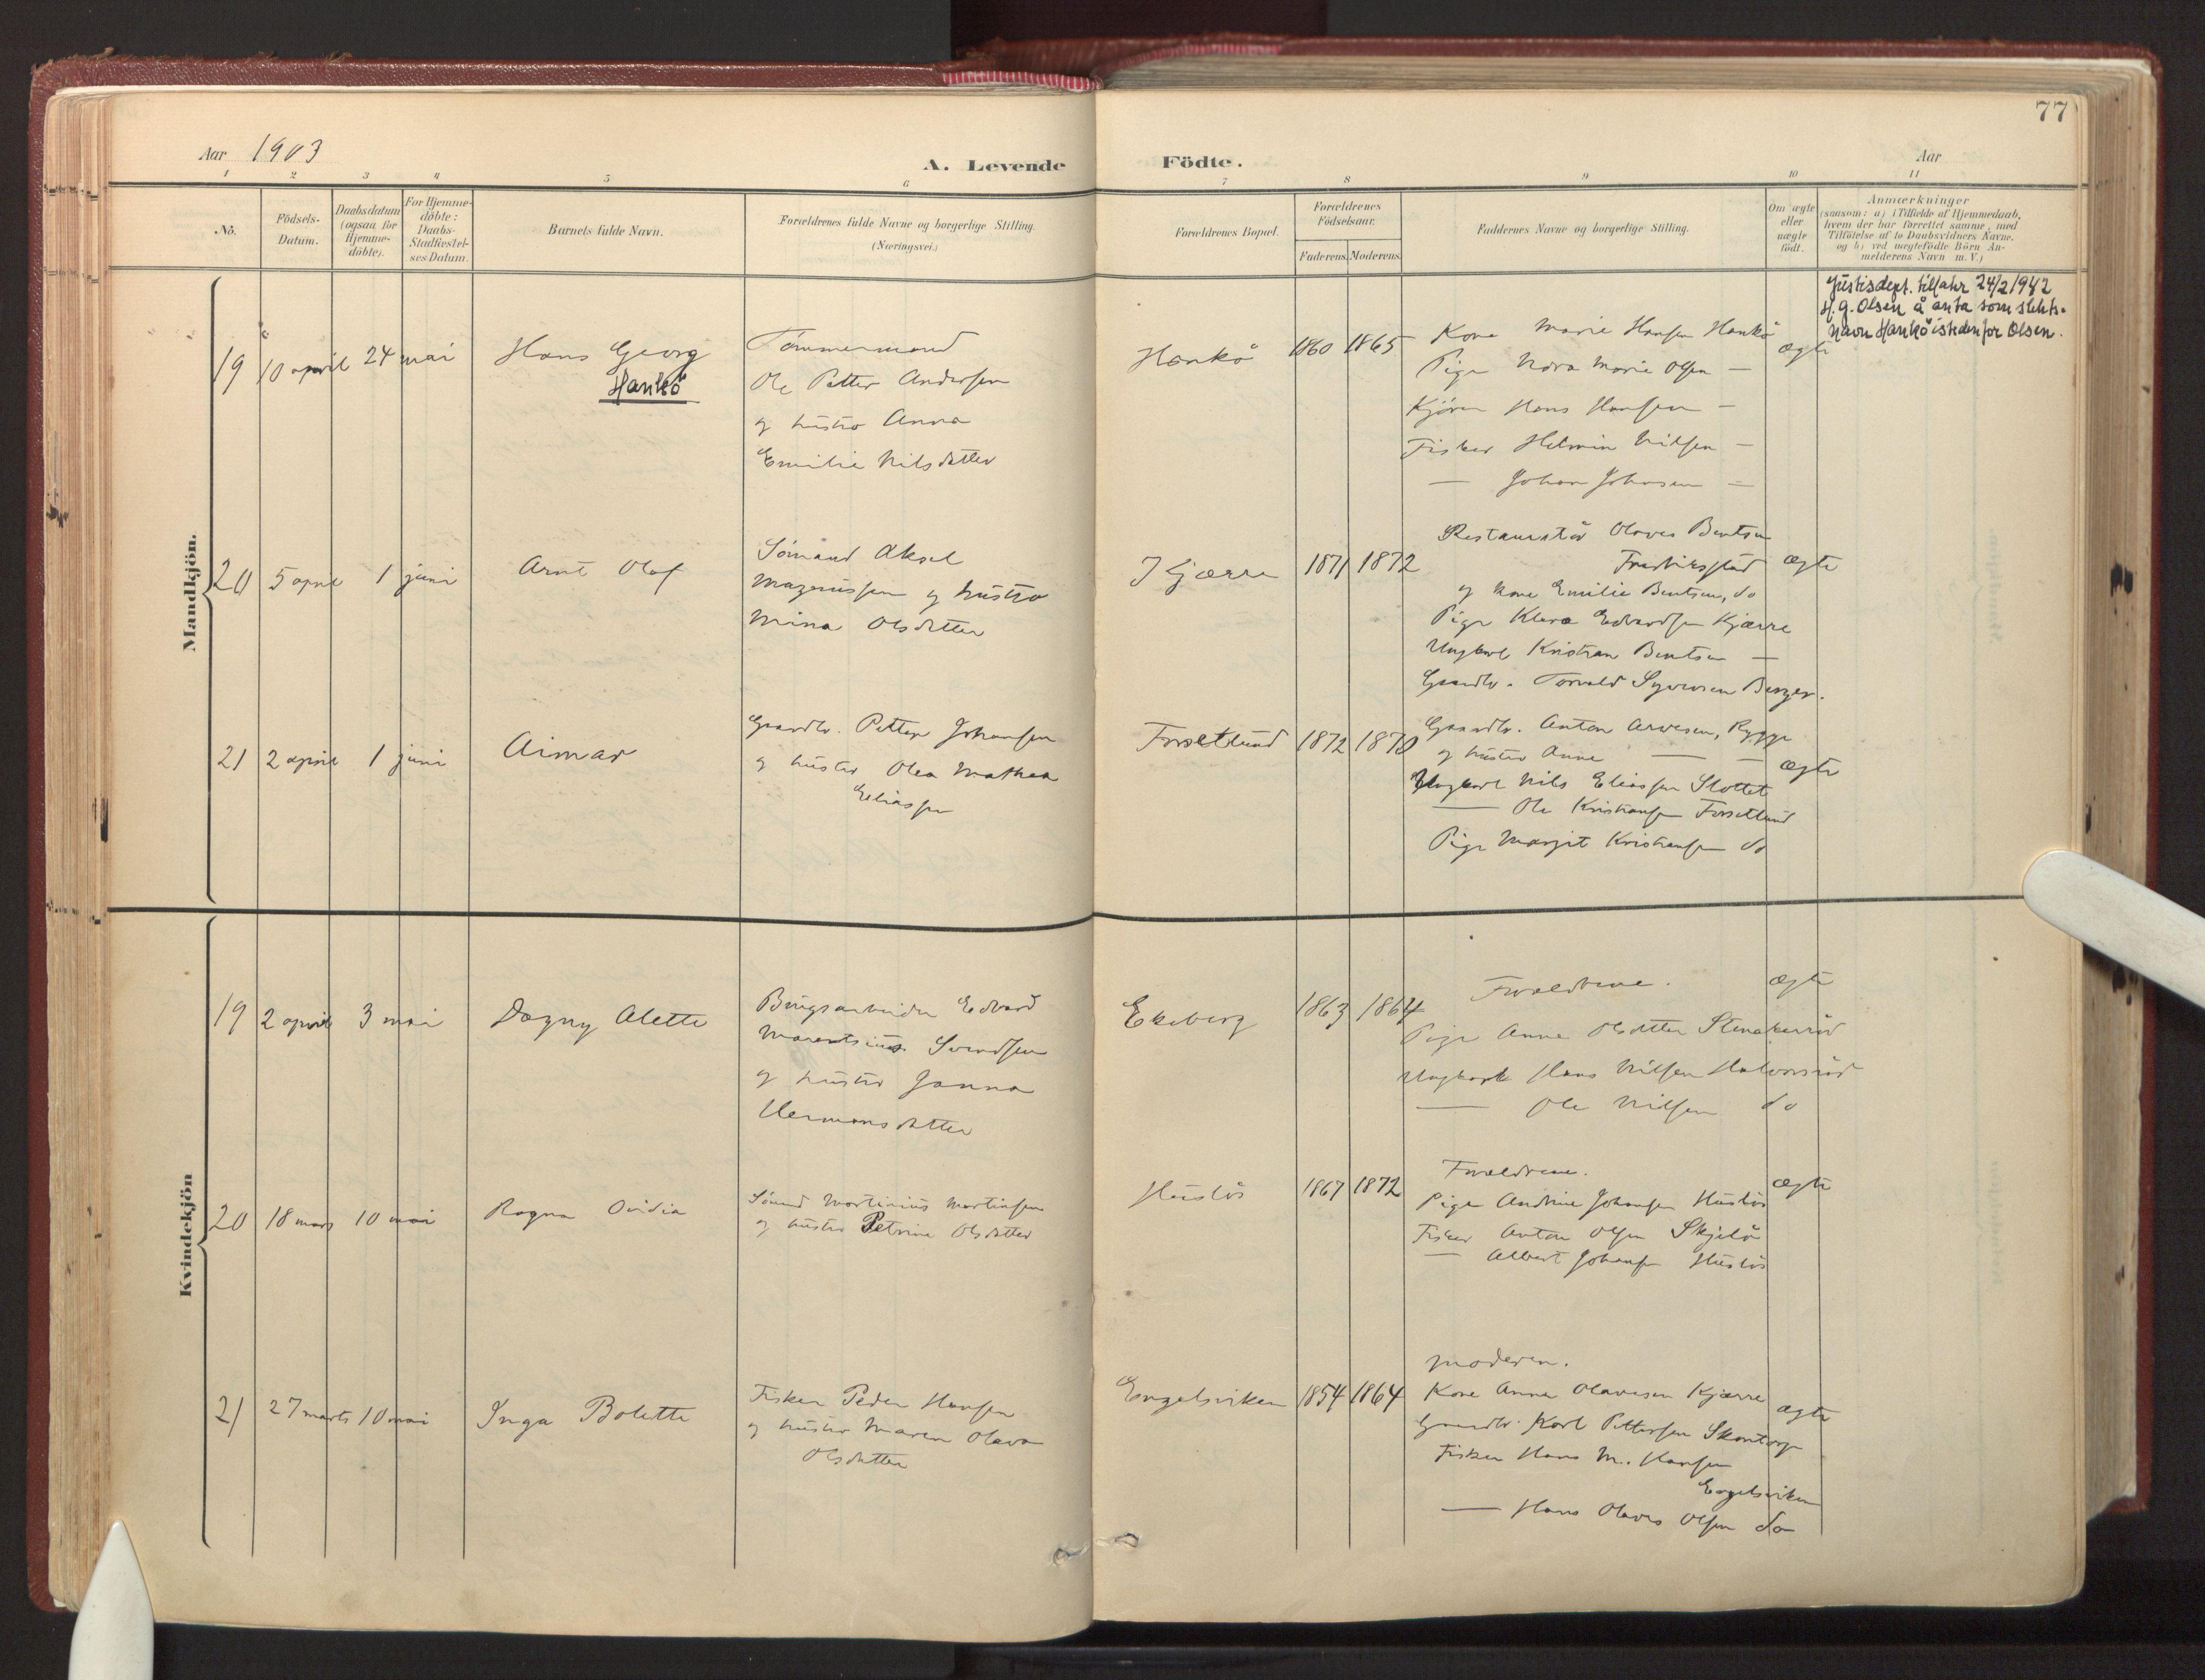 SAO, Onsøy prestekontor Kirkebøker, F/Fa: Ministerialbok nr. I 8, 1899-1923, s. 77